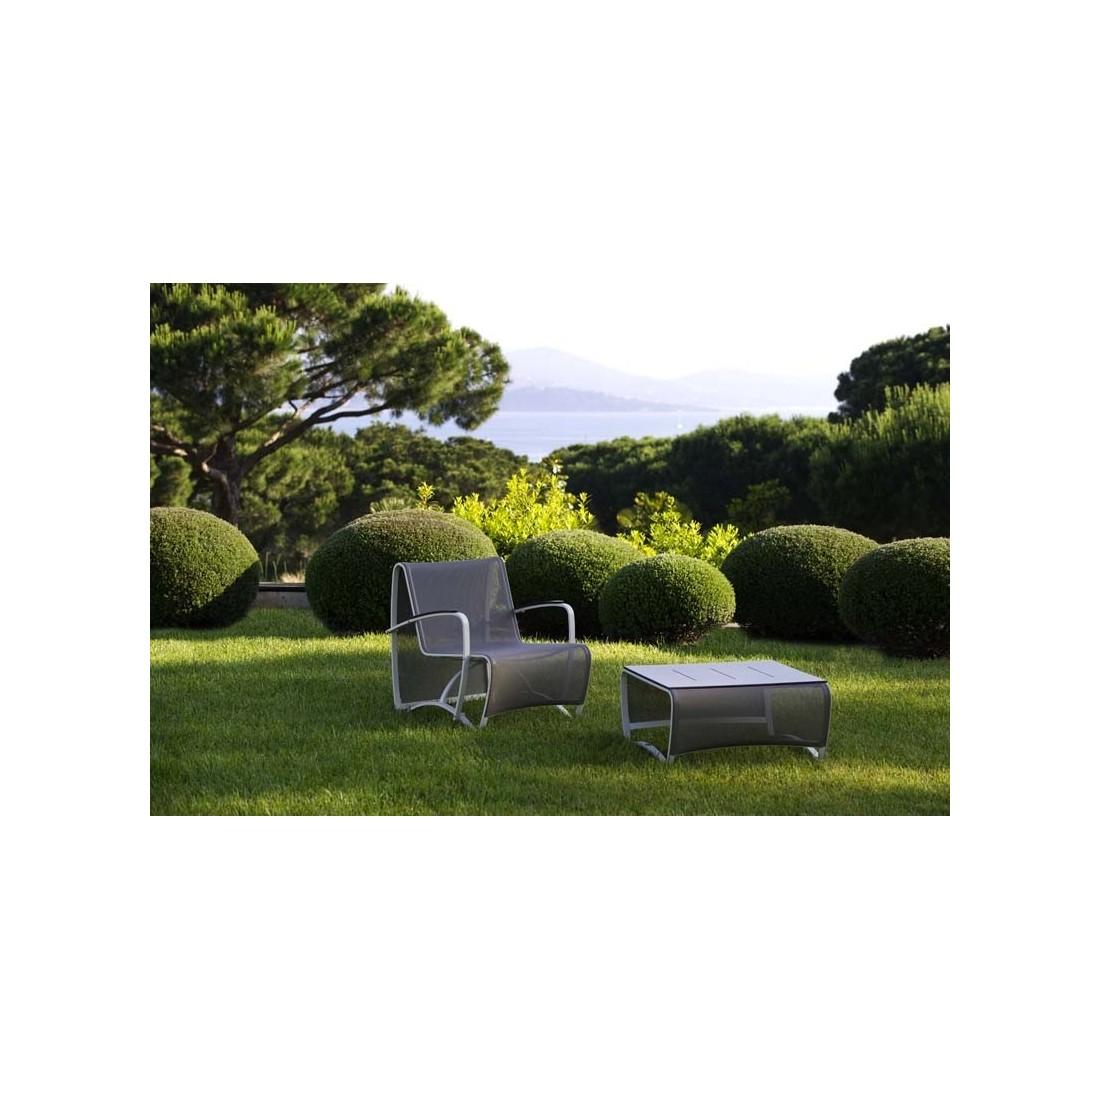 Module Jet Stream, Grege/Taupe, Les Jardins Les Jardins Confort Jardin